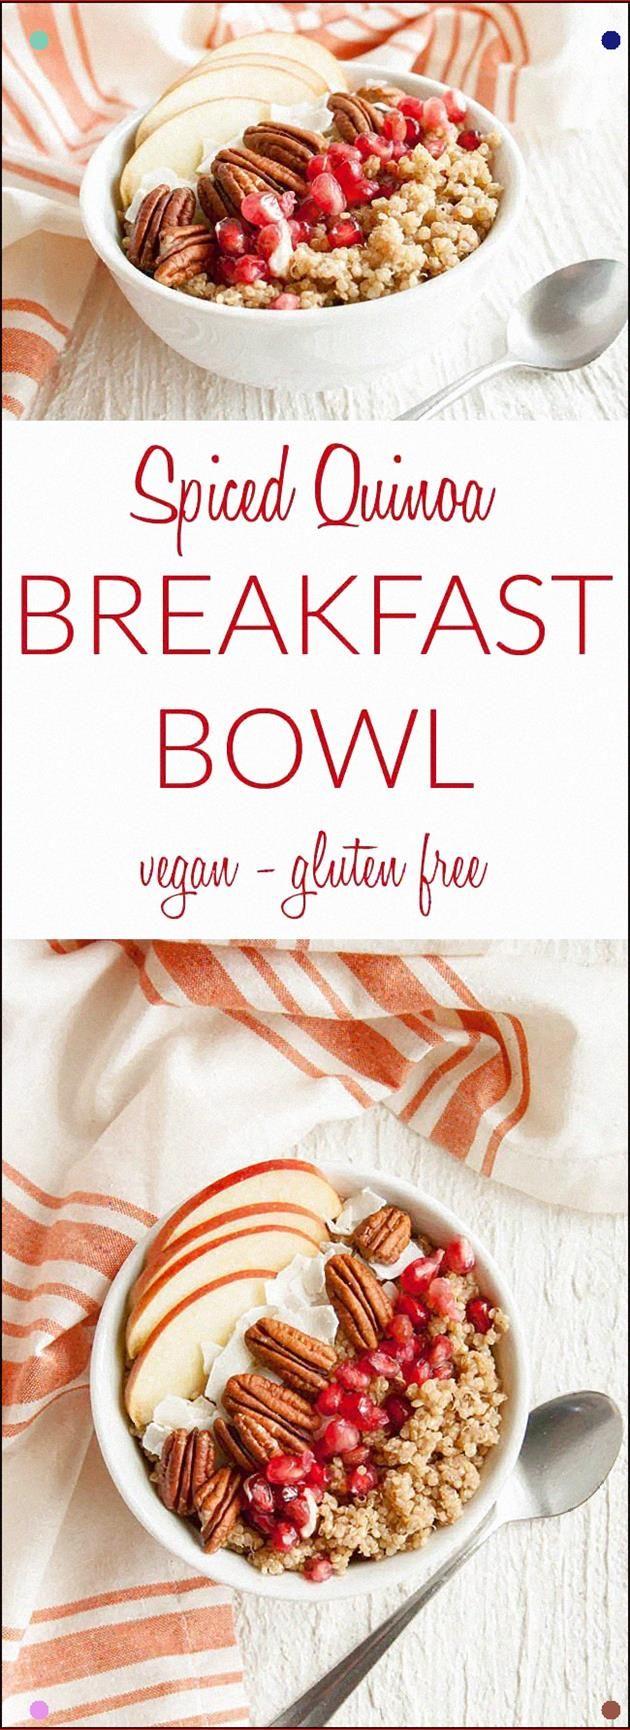 Spiced Quinoa Breakfast Bowl Vegan, Gluten Free – This Healthy Protein Rich Brea…